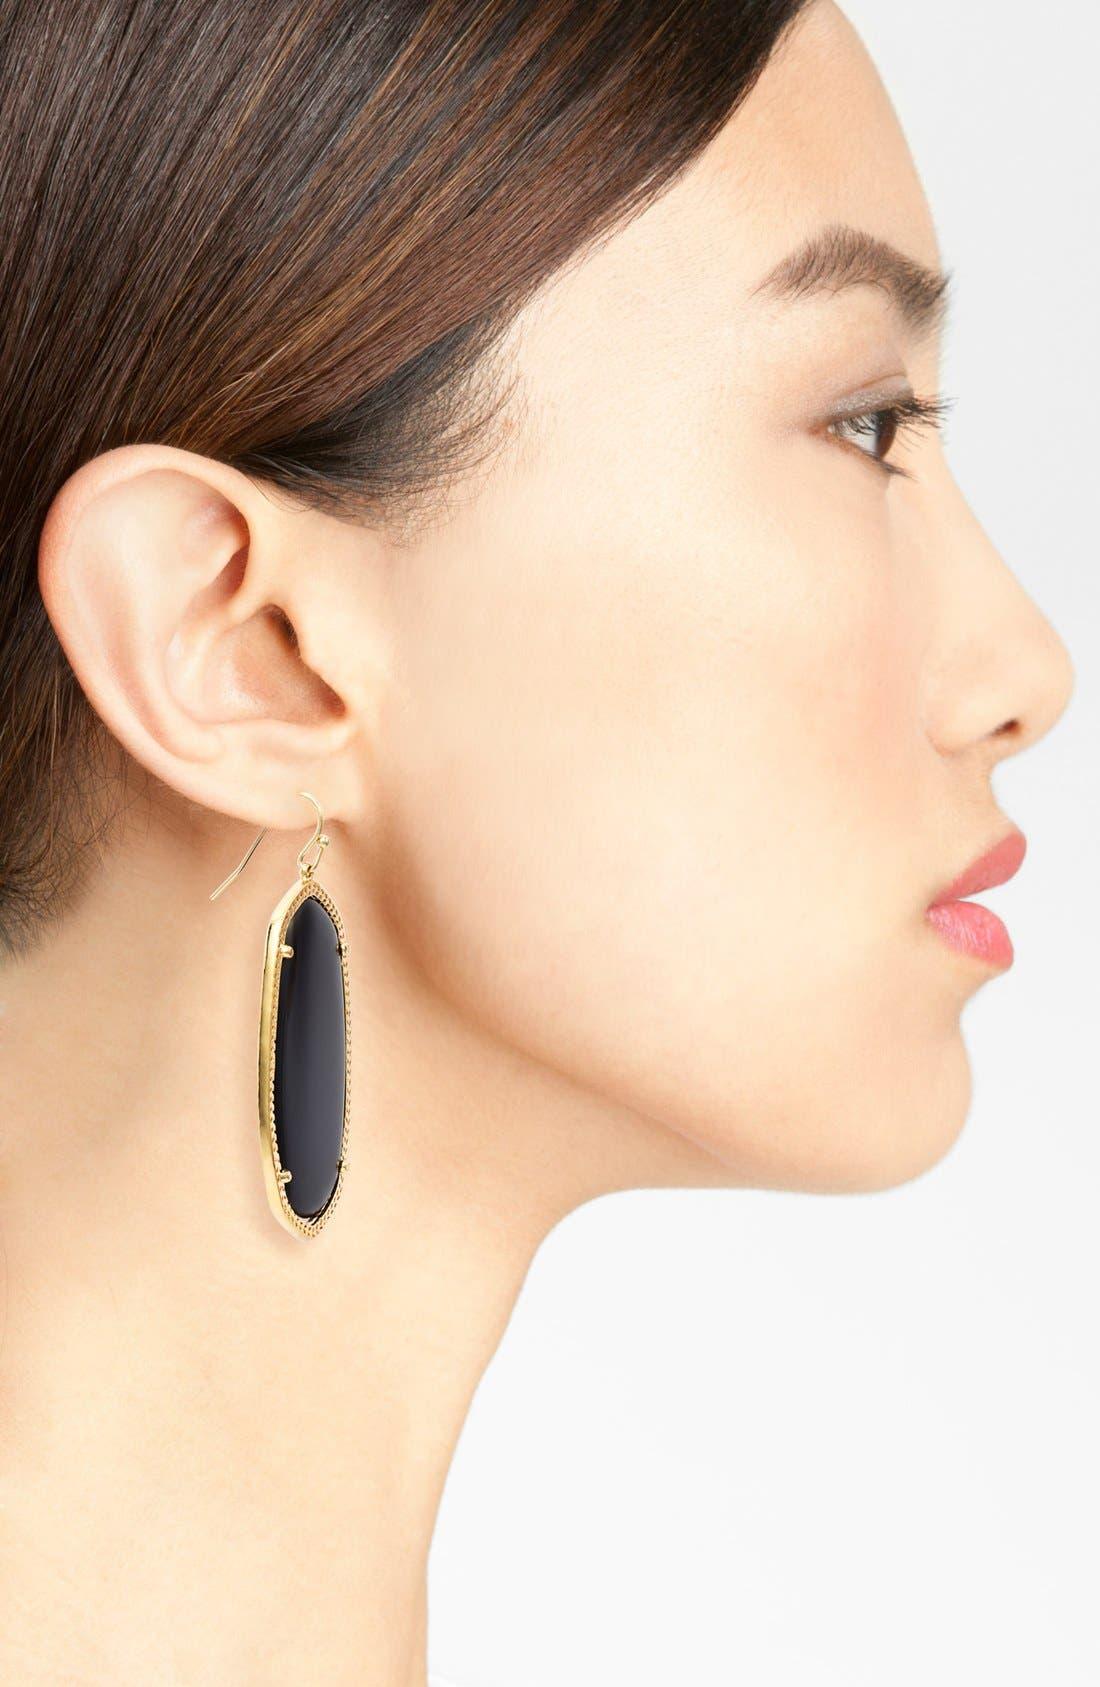 'Danielle' Oval Statement Earrings,                             Alternate thumbnail 4, color,                             001